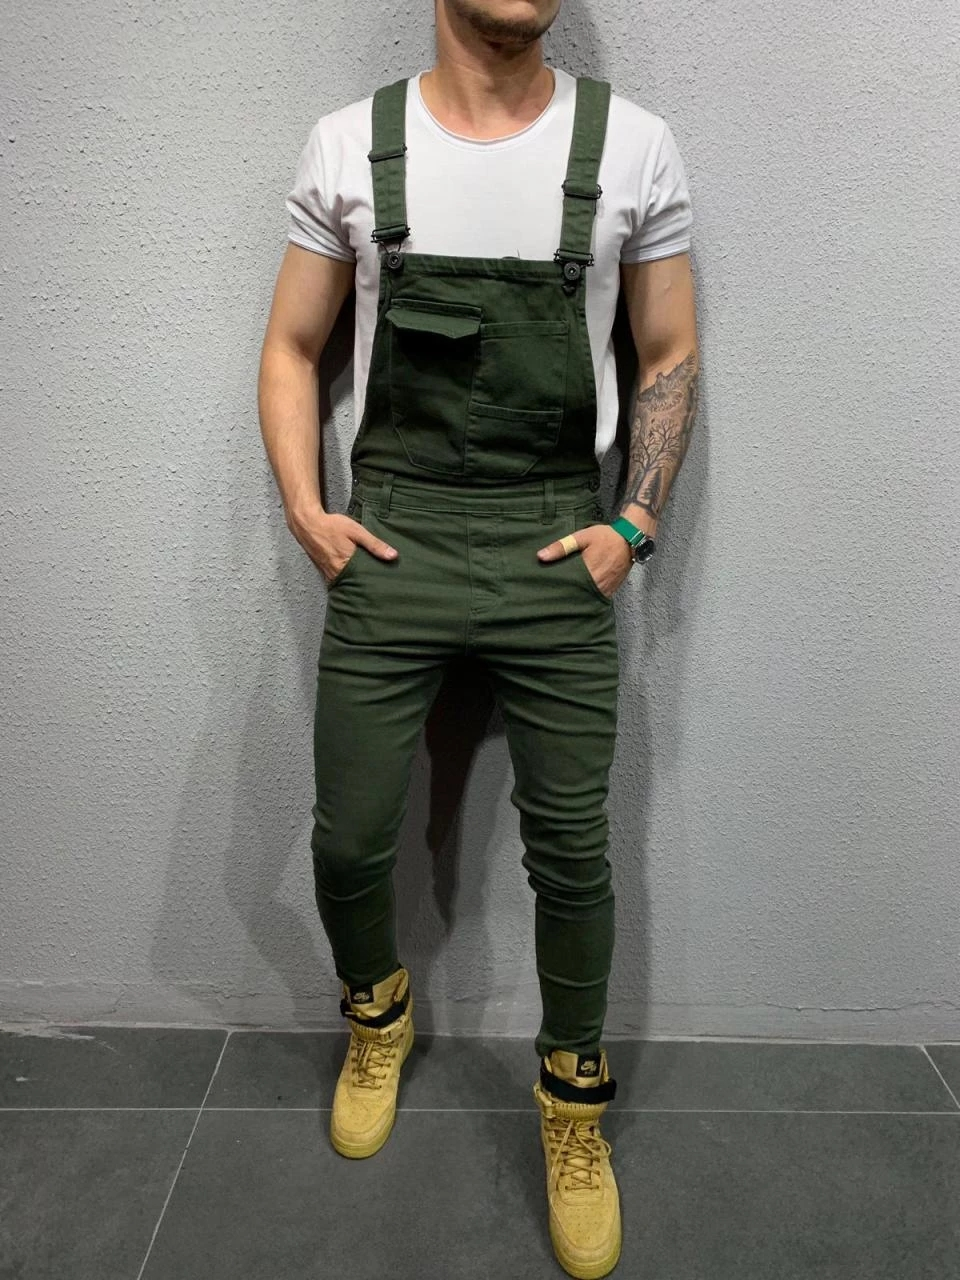 Men's Suspenders, Personalized Multi Button Fit Jogger Casual Jumpsuit